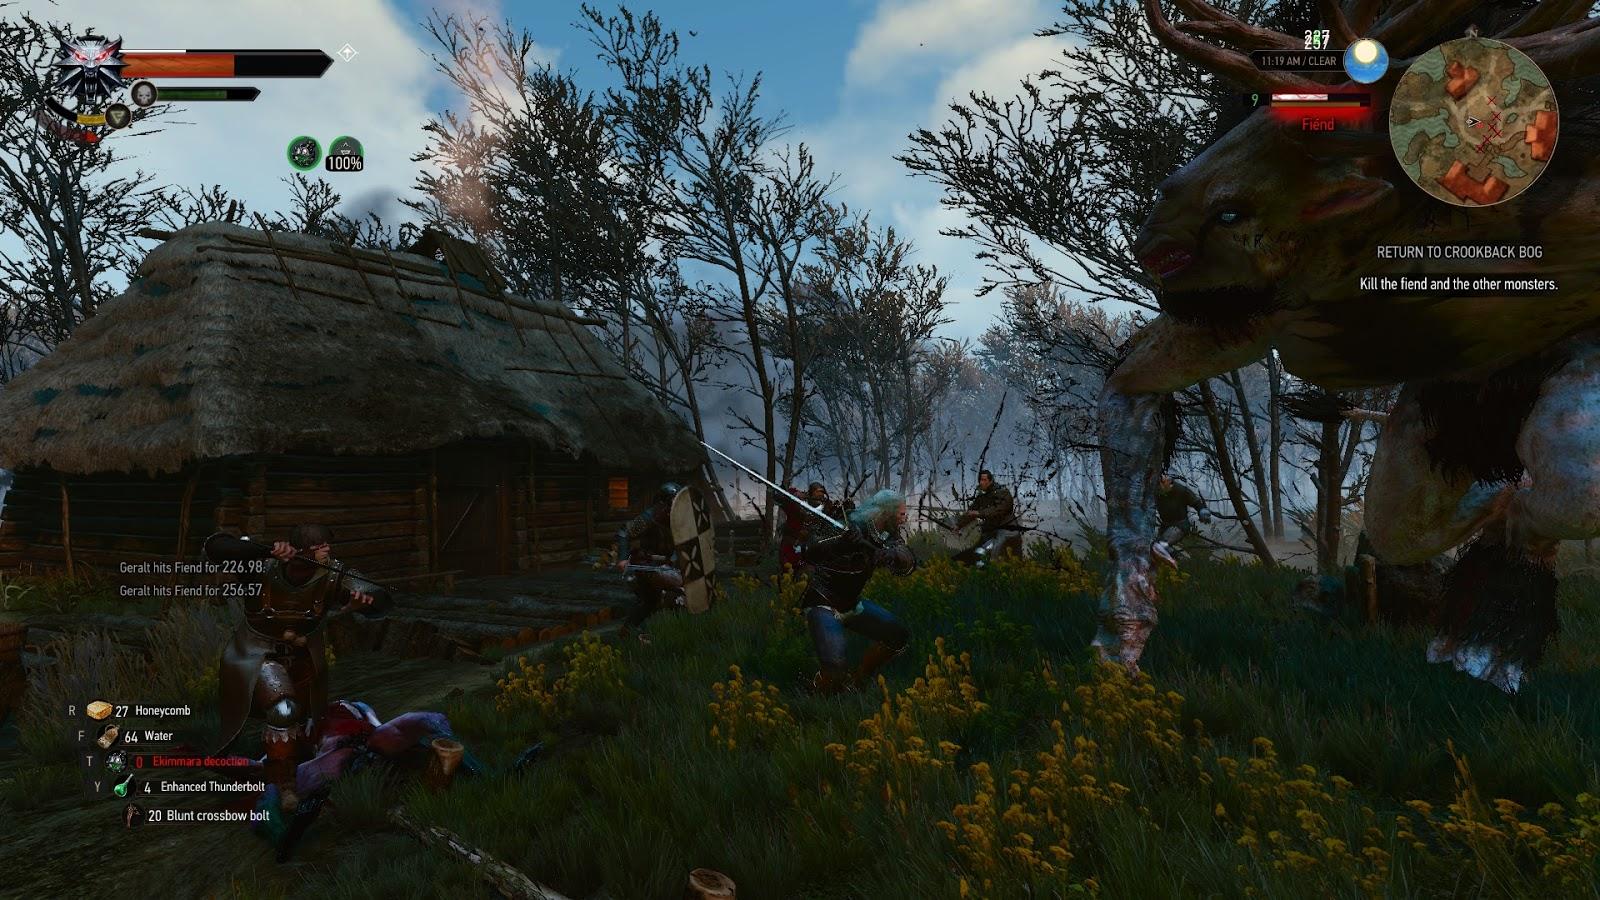 Patterns in Randomness: The Witcher 3: Wild Hunt